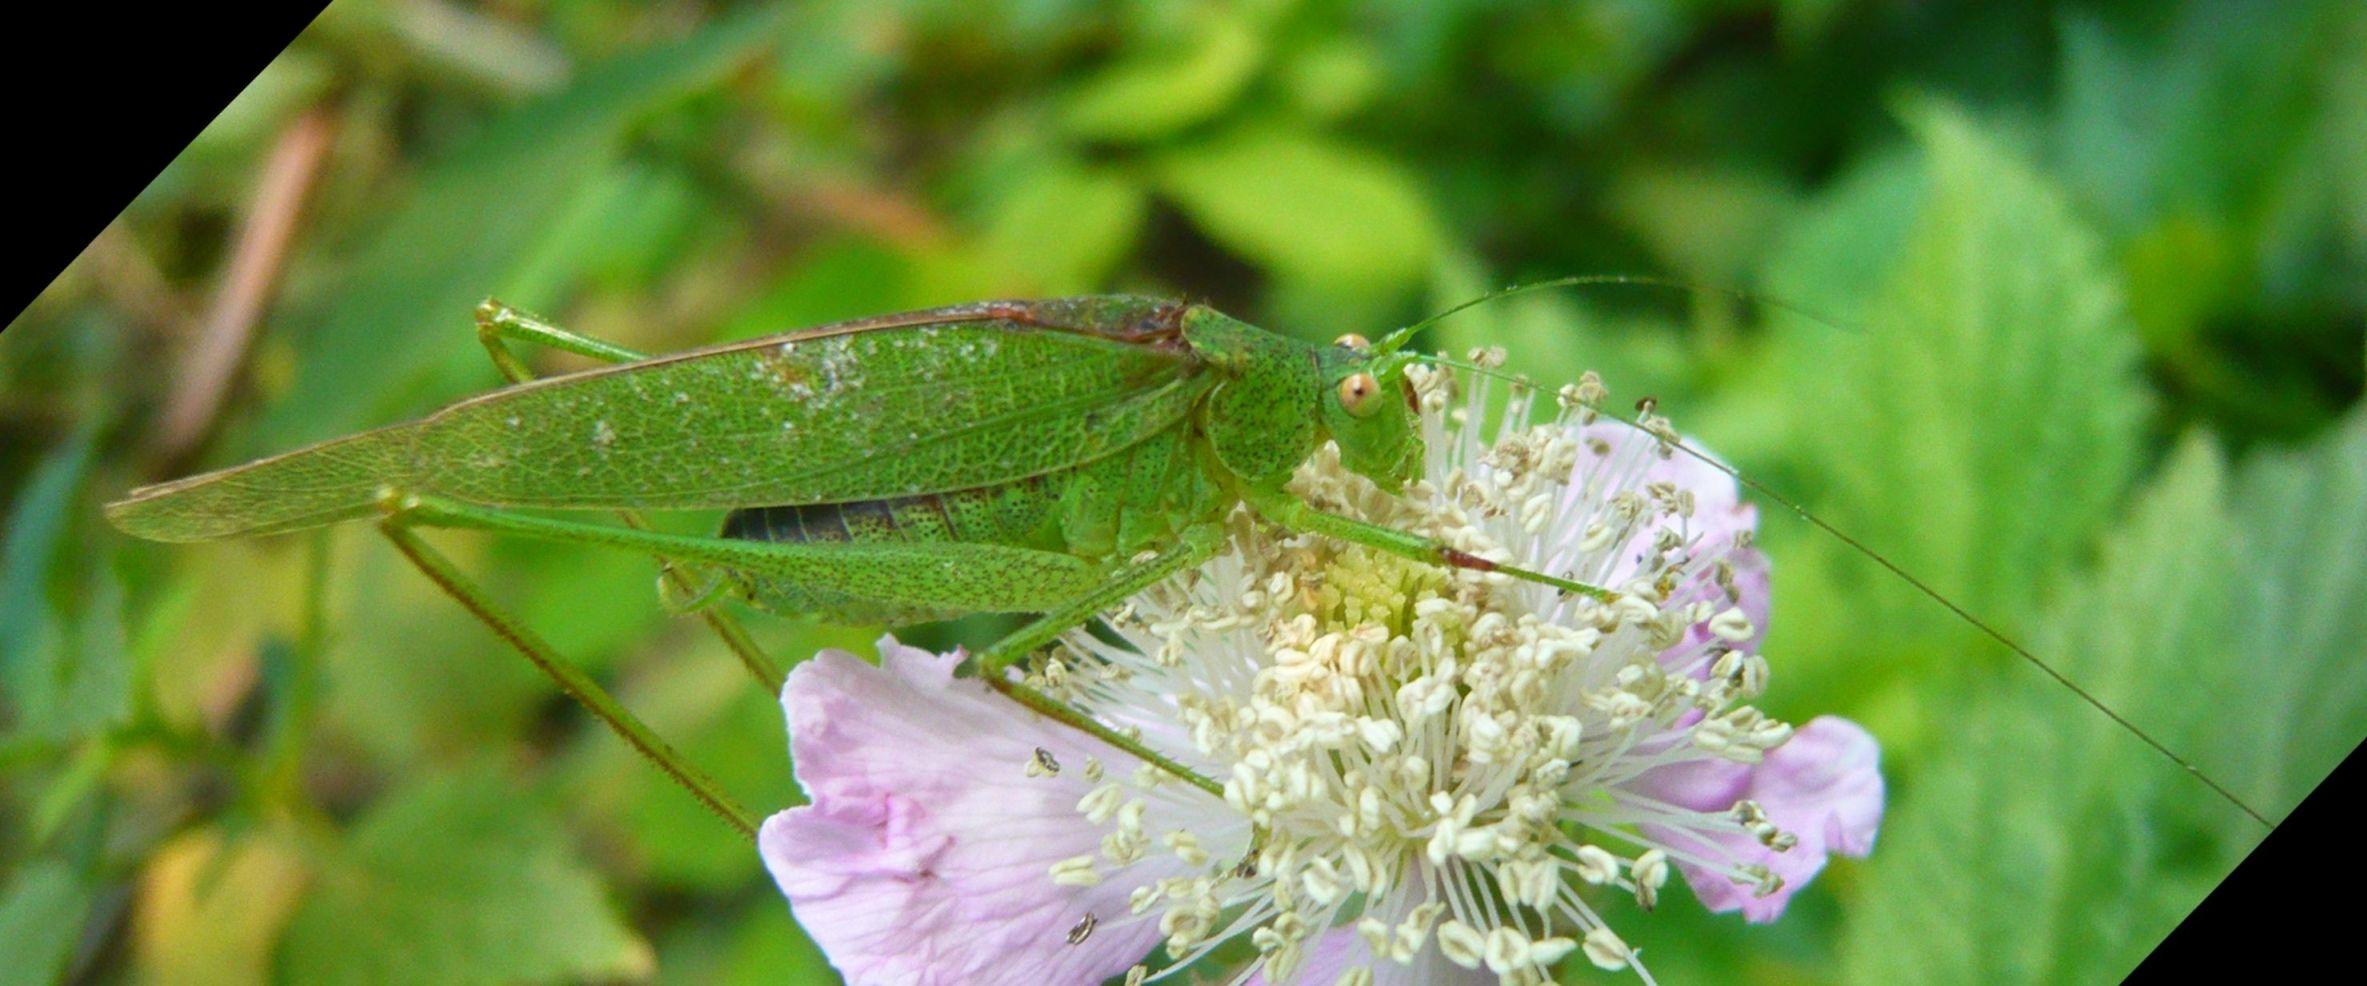 Phaneroptera sp., maschio